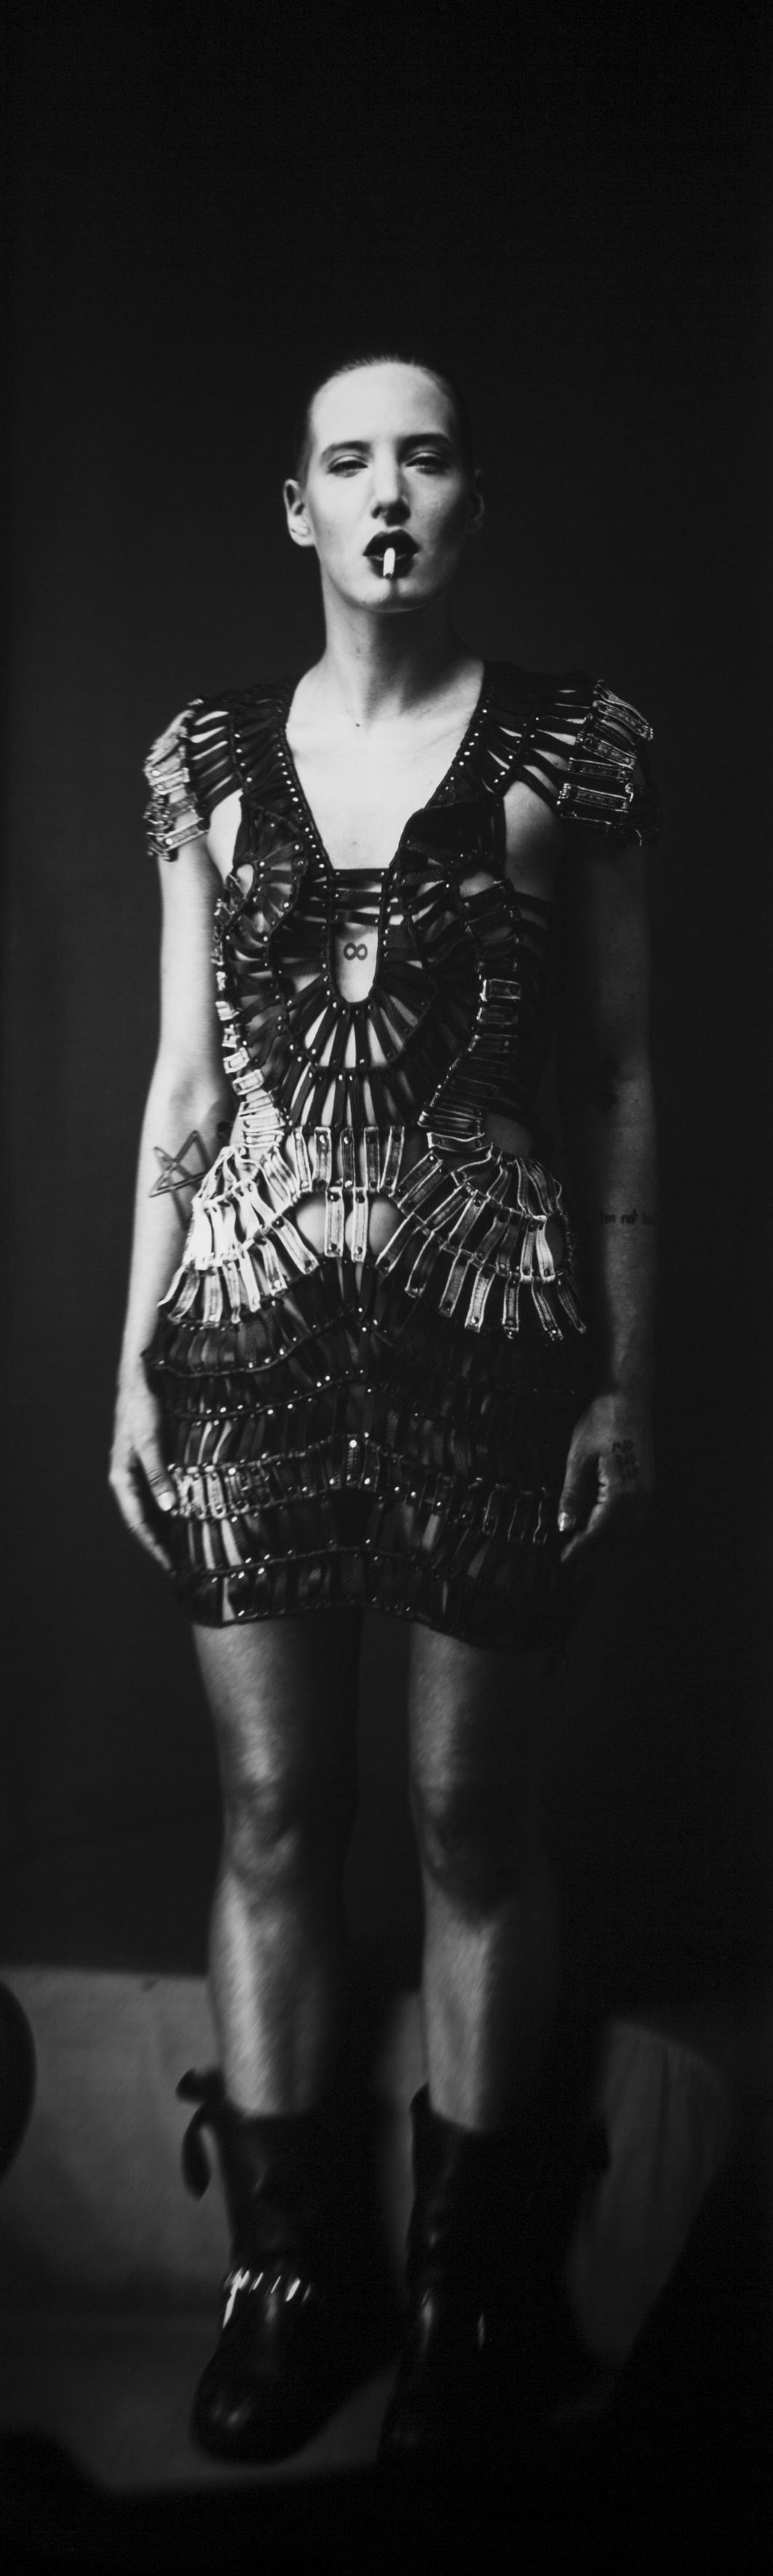 Kat_Voltage_07©IMAGO-CAMERA_Susanna-Kraus (1)